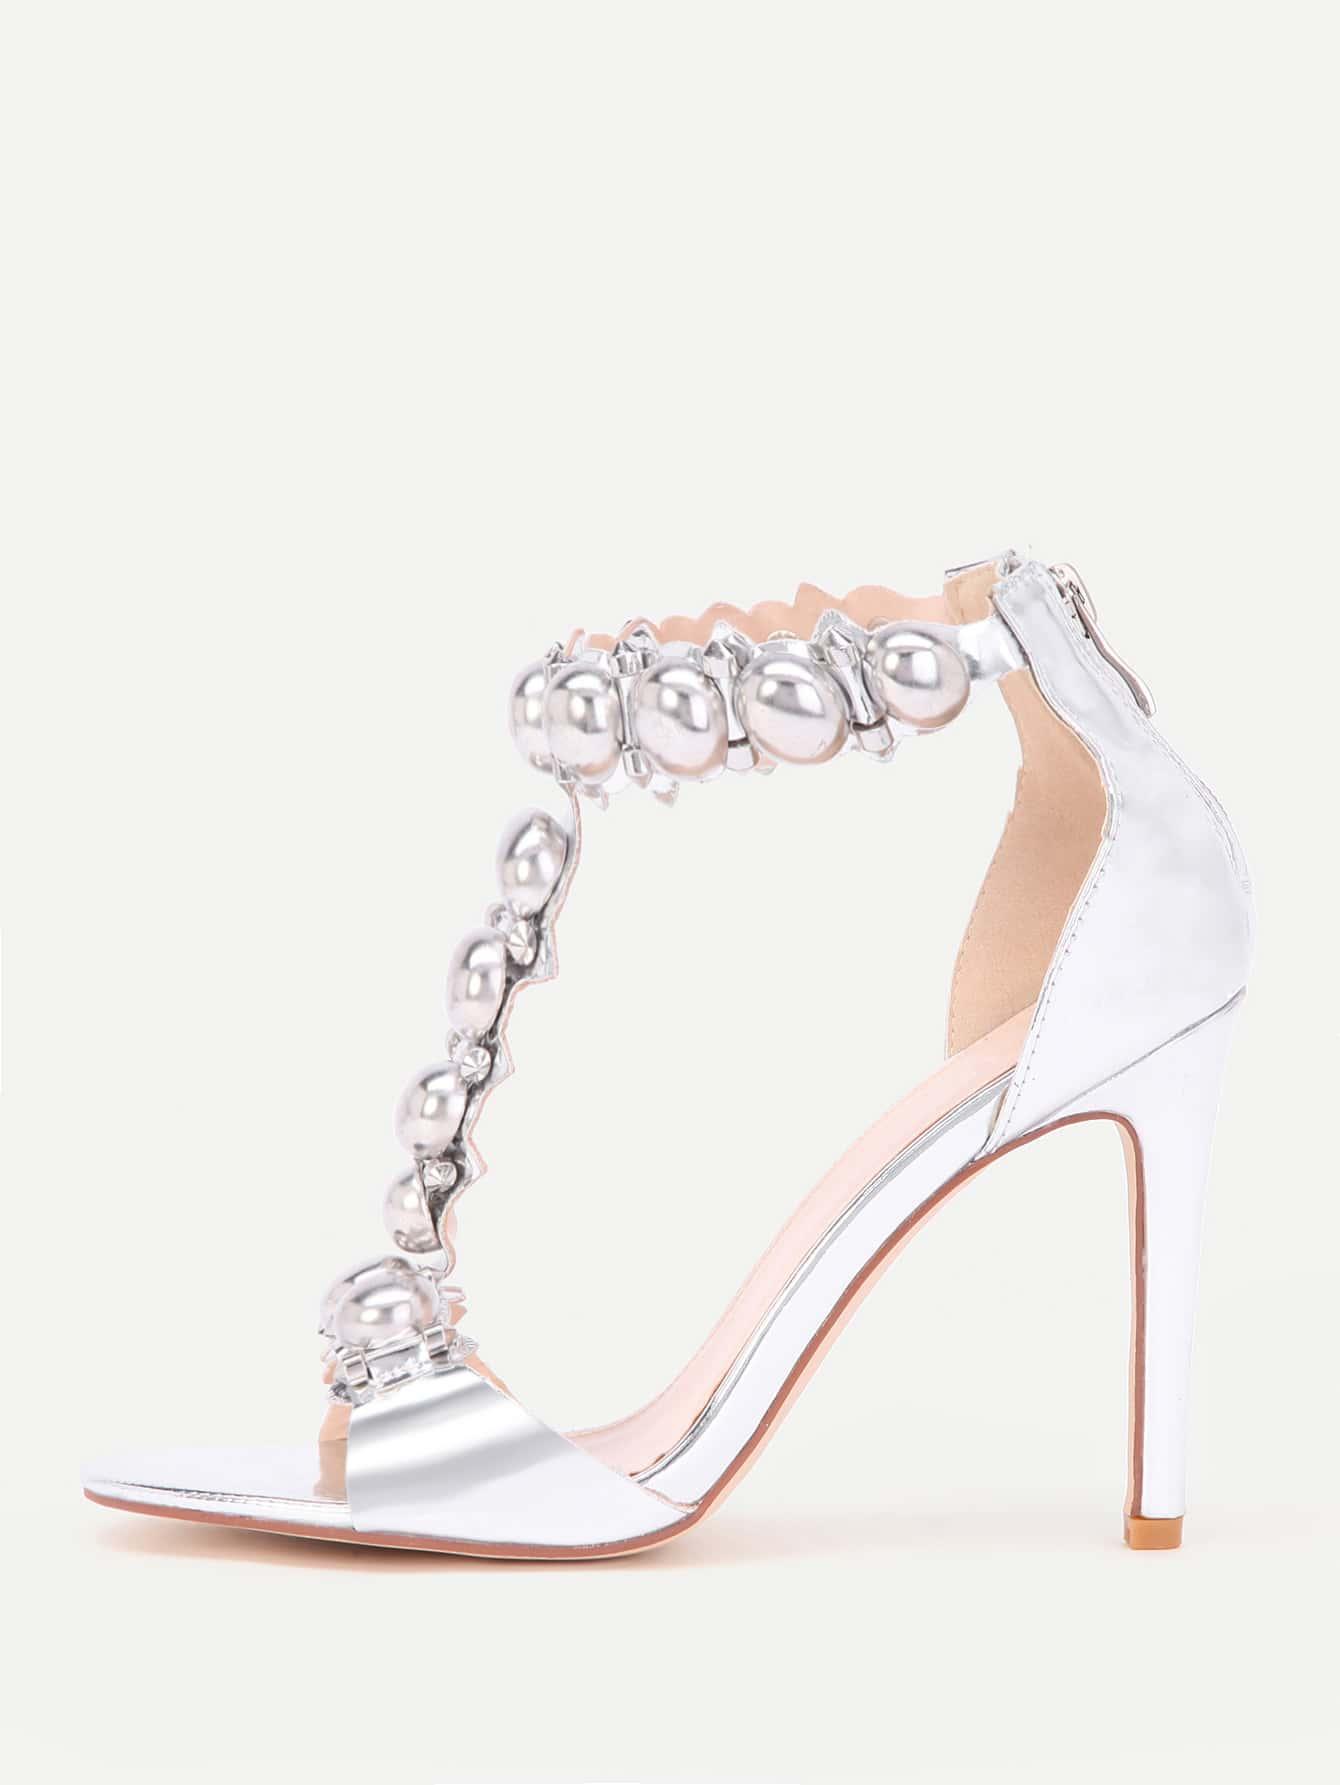 Metallic T Strap High Heels shoes17070306